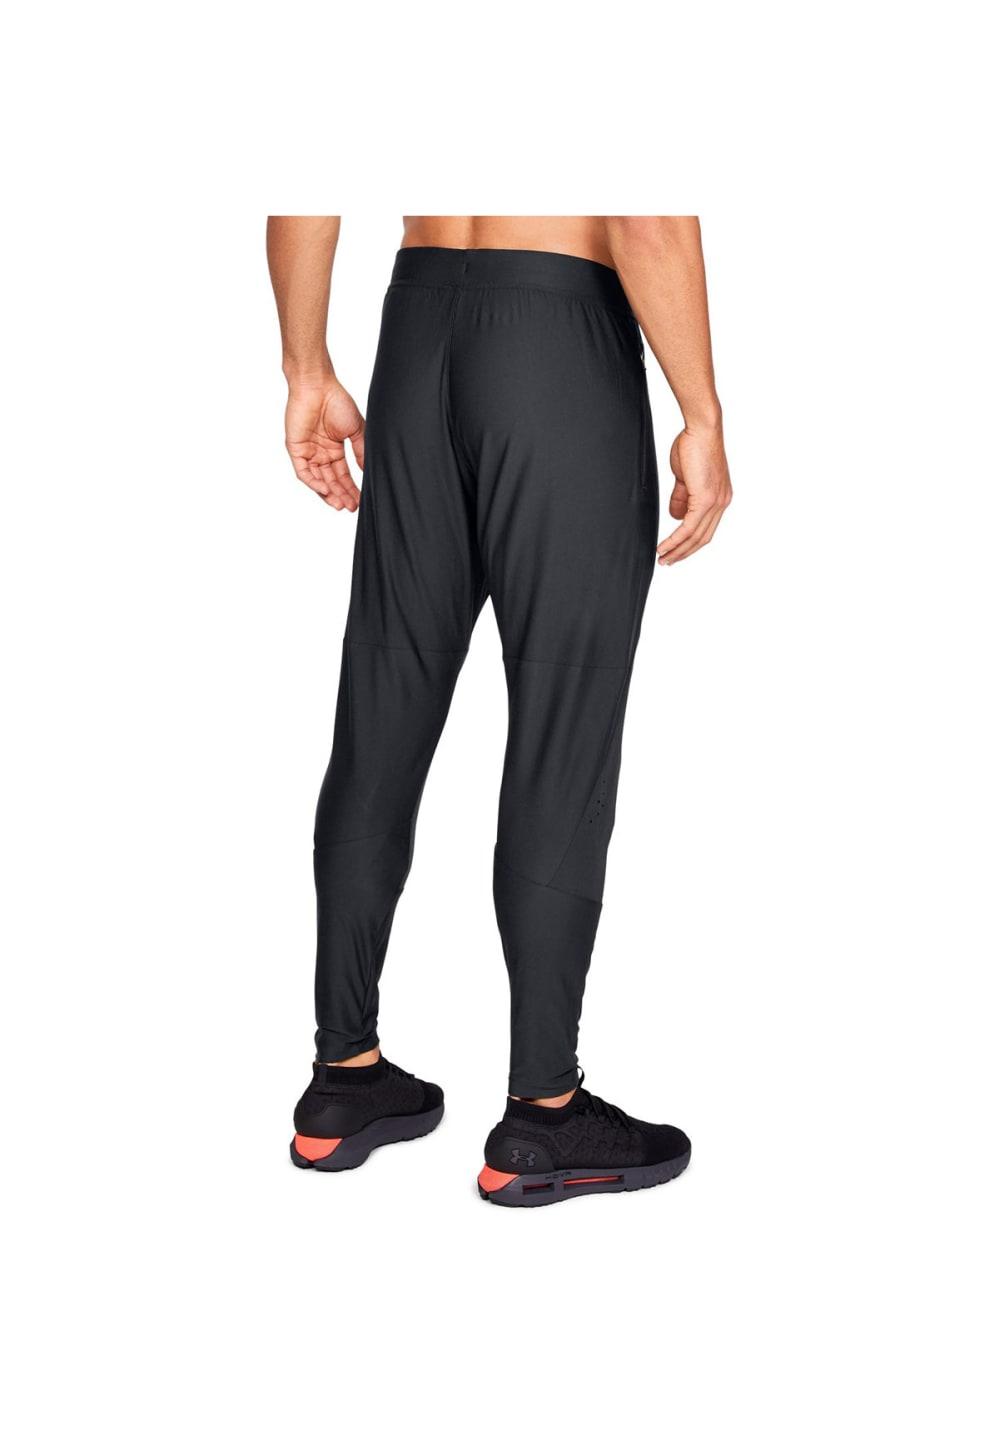 Threadborne Pant De Hombre Negro Para Under Pantalones Armour Vanish Fitness DHIeE2W9Y